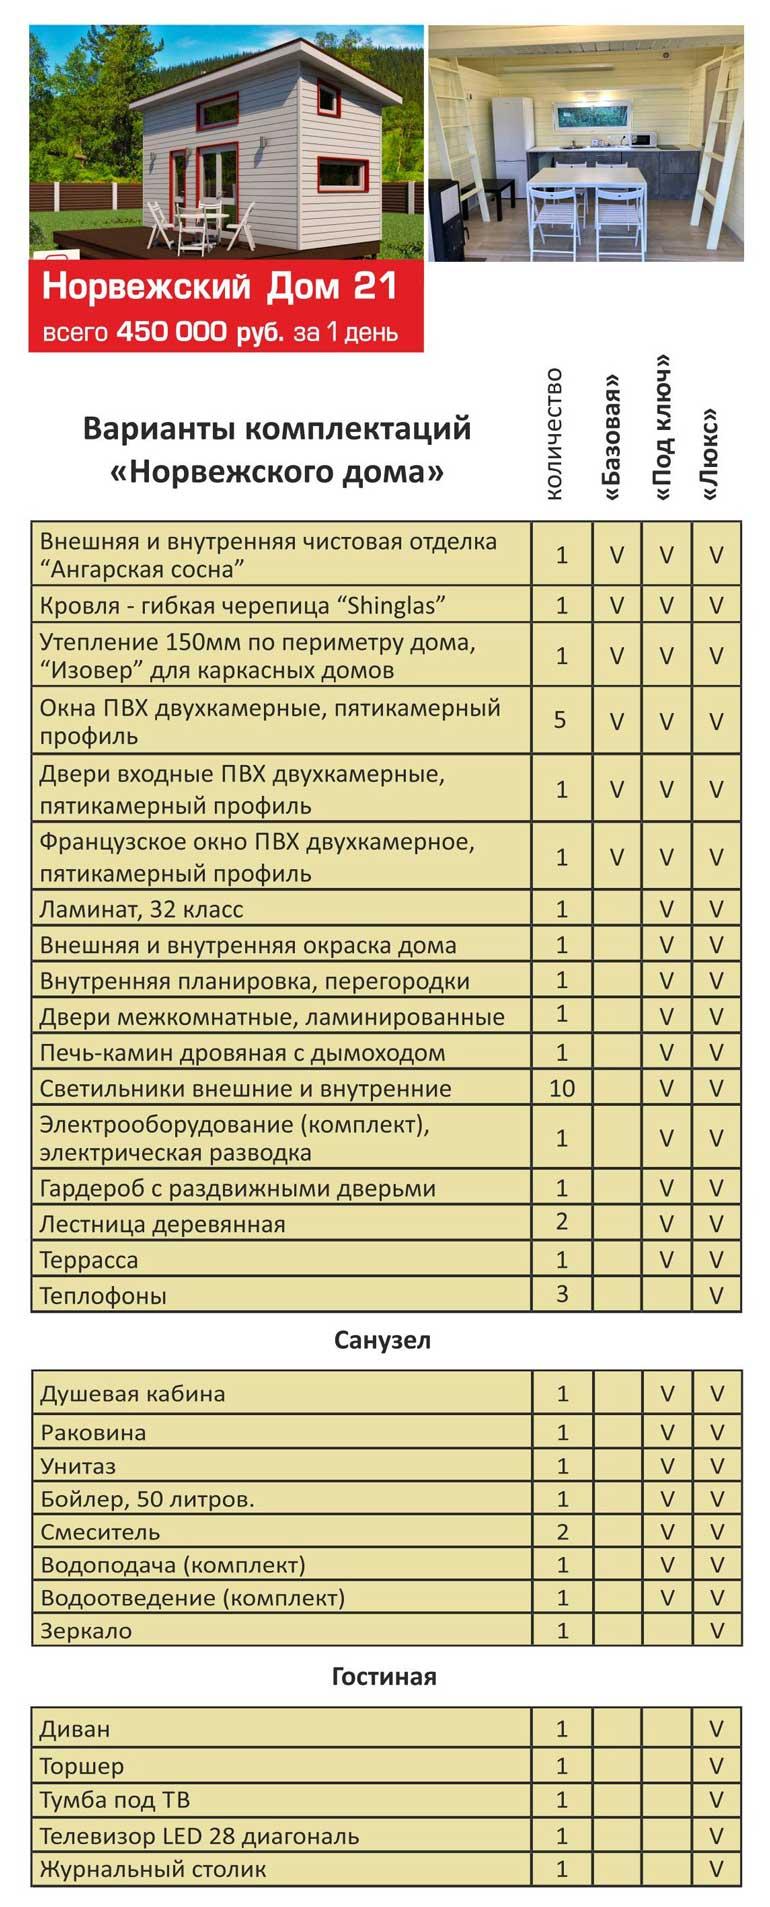 norvezhskiy-dom-21-smart-v-kurske